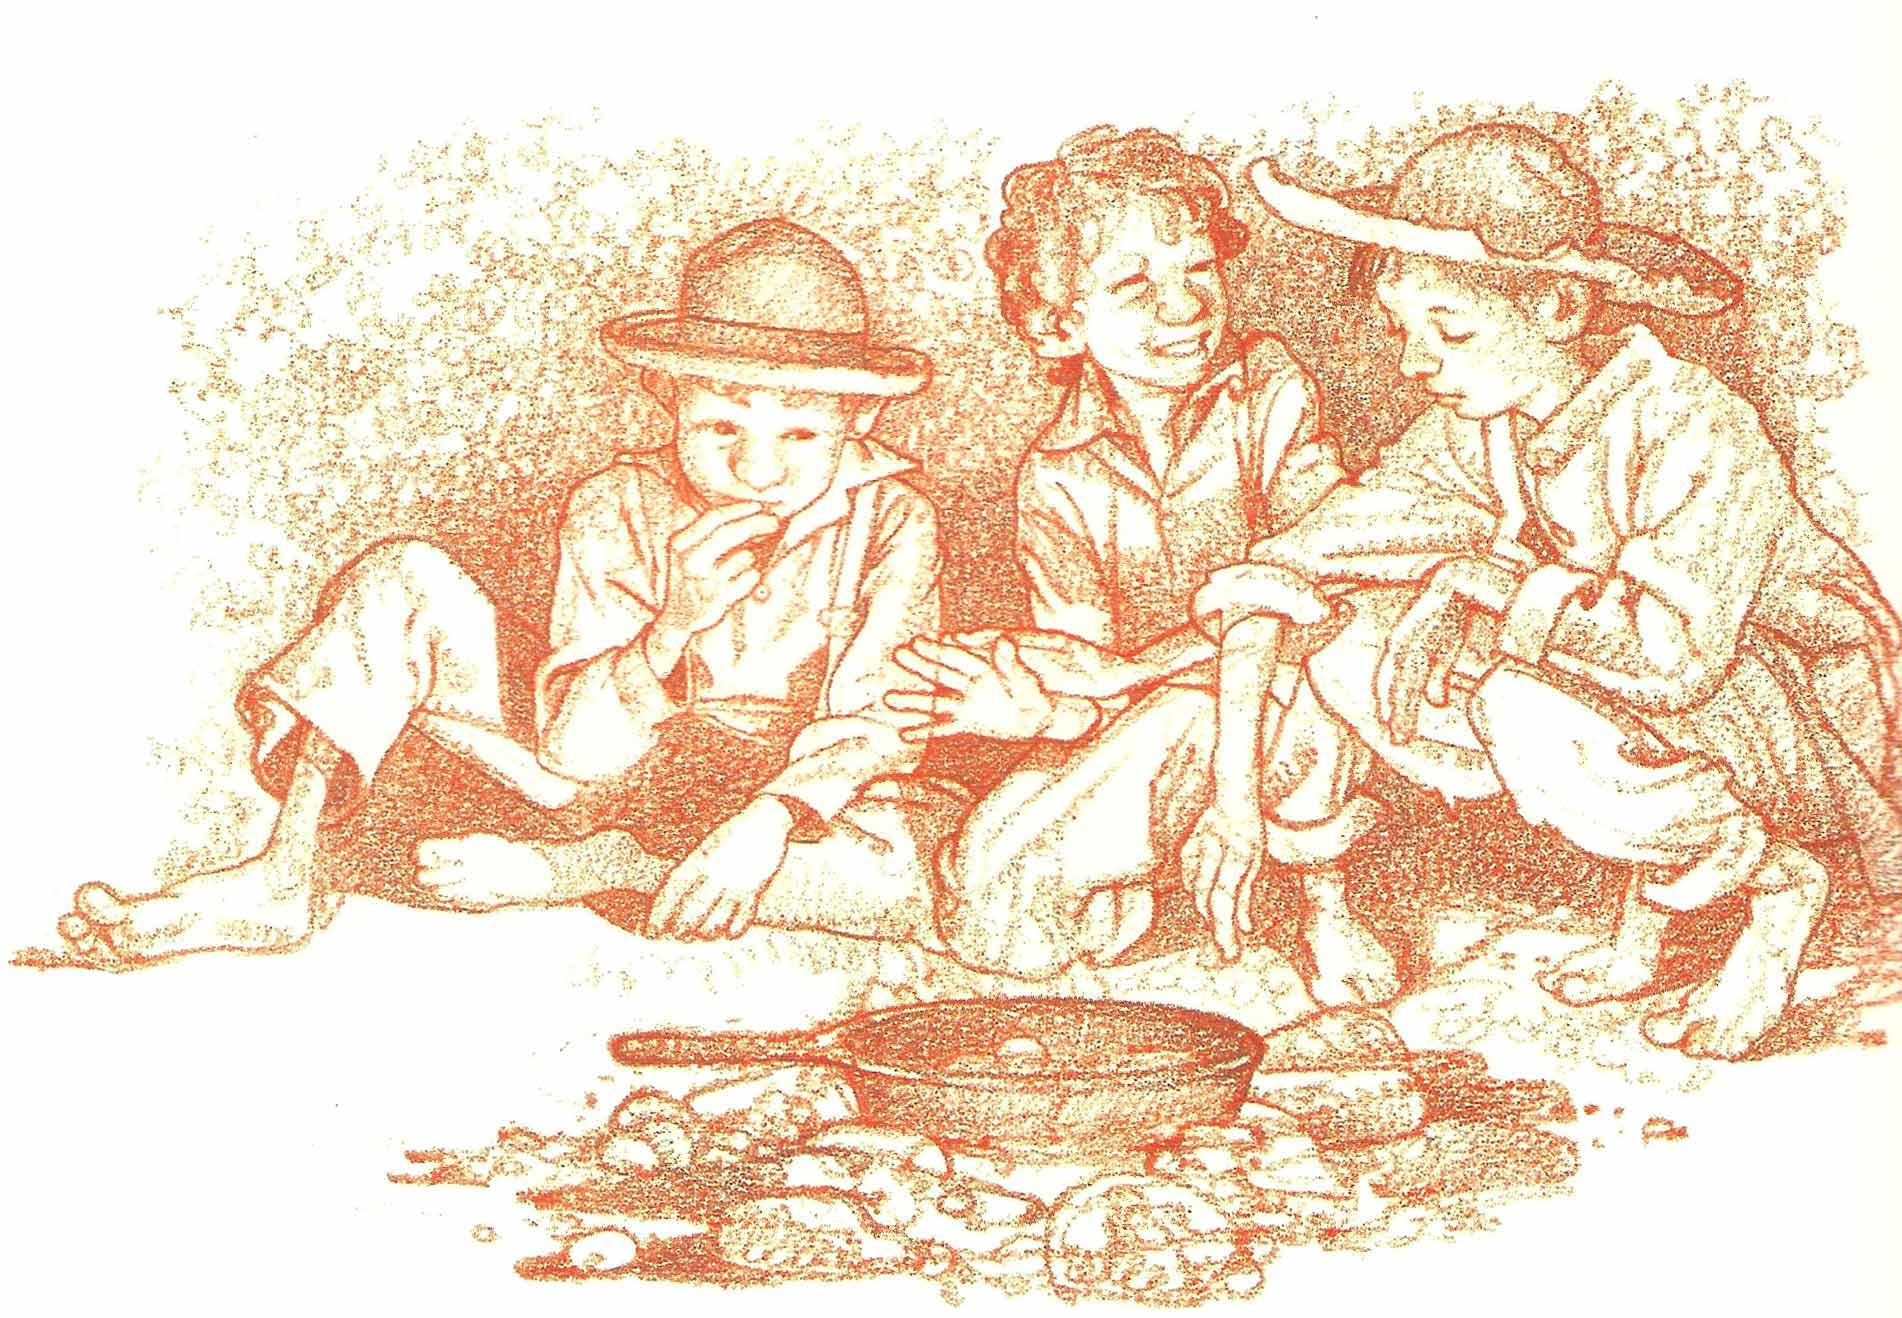 http://aeqai.com/main/wp-content/uploads/2015/12/The-Runaways-Cook-Their-Meal.jpg